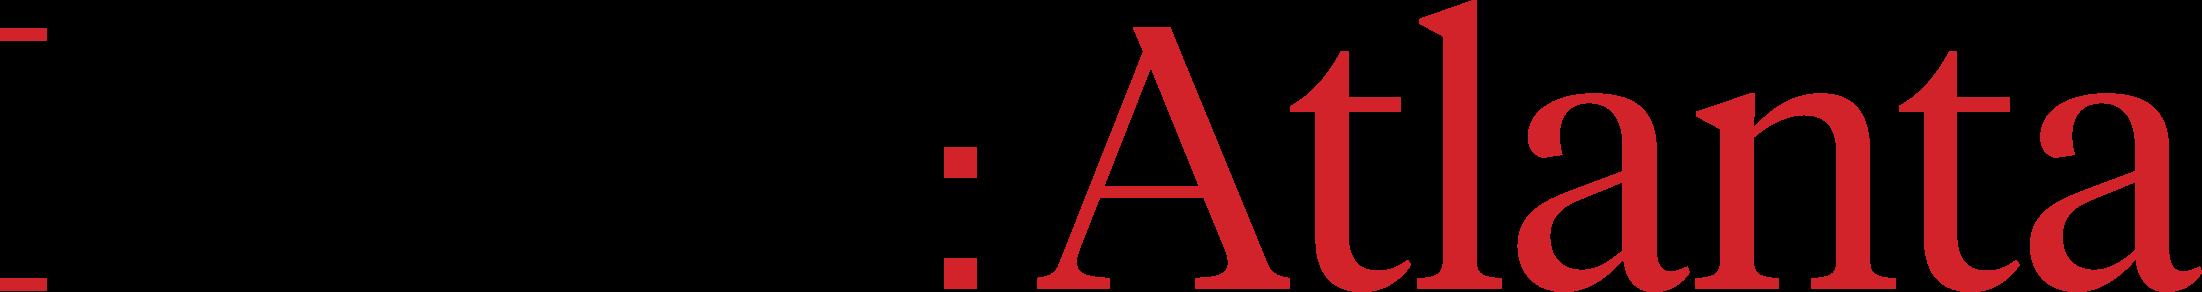 Focus Atlanta Clear Canvas logo.png